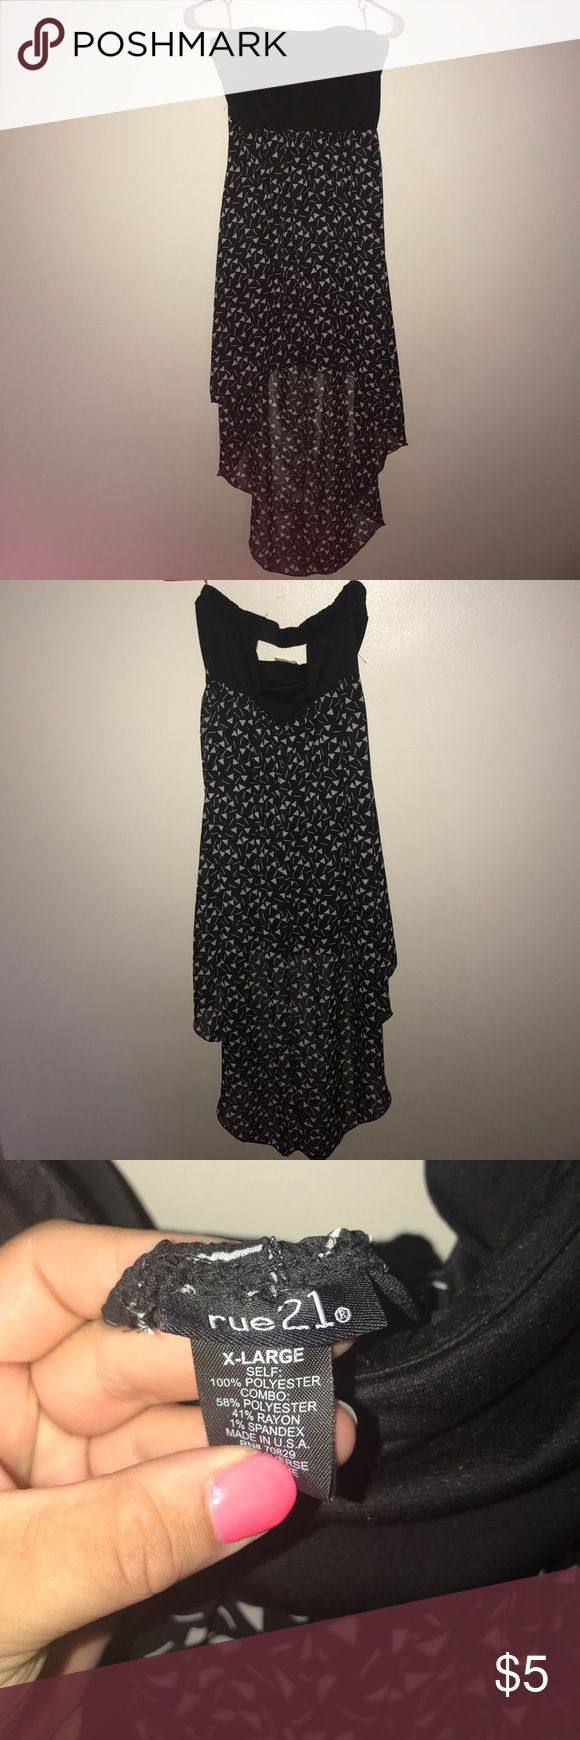 Black dress rue 21 $5 dresses